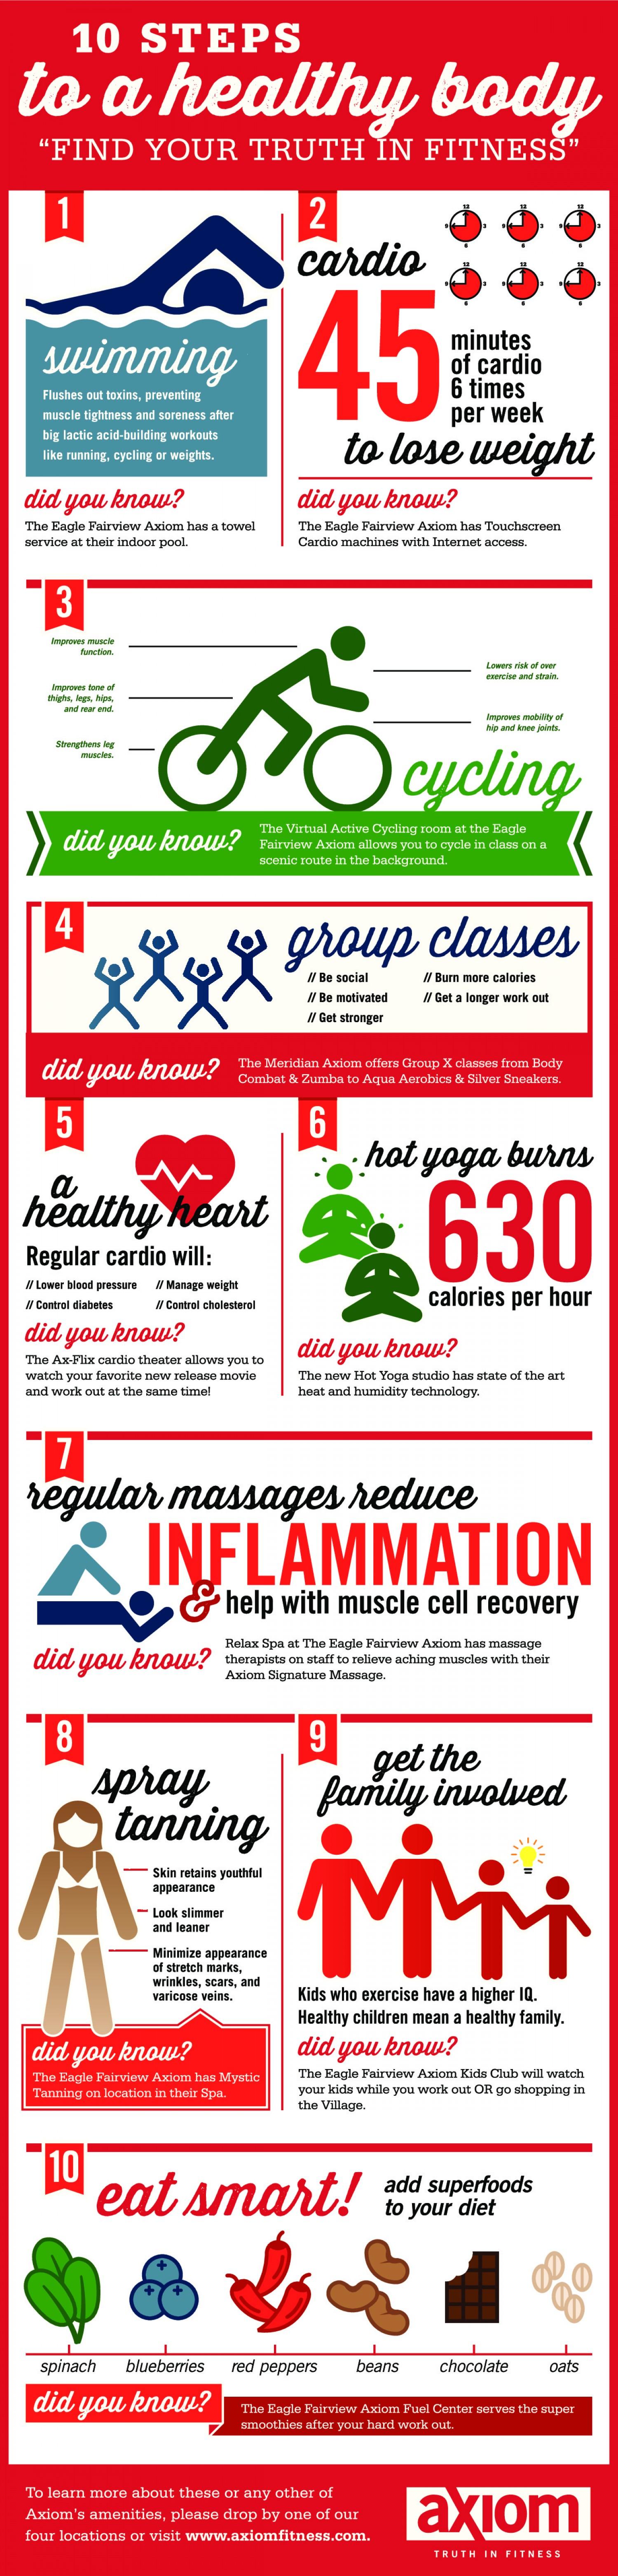 10-steps-to-a-healthy-body_5286a07553861_w1500